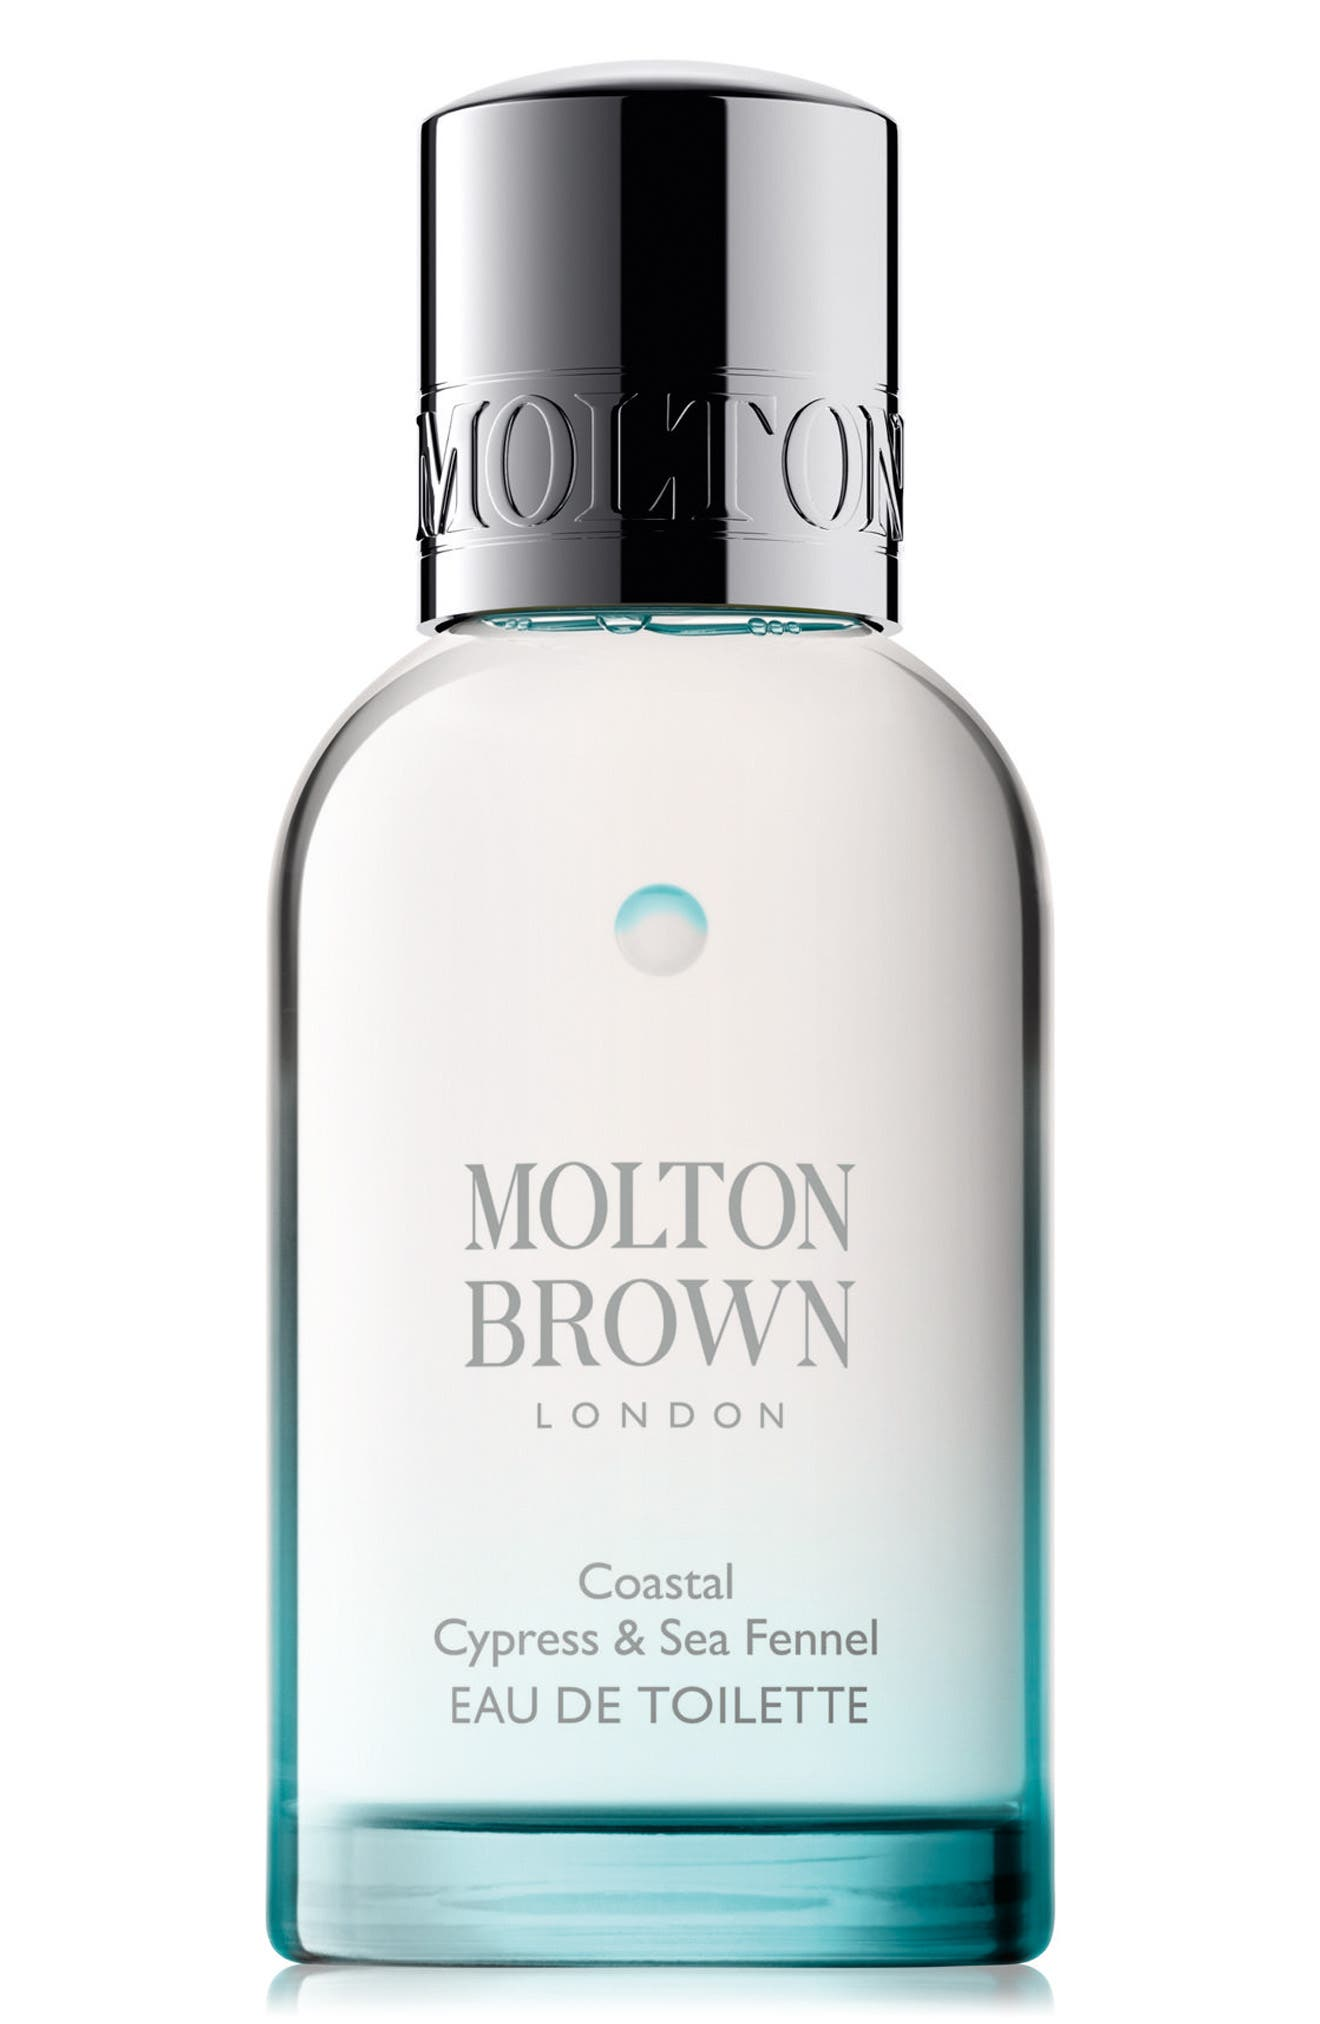 MOLTON BROWN London Coastal Cypress & Sea Fennel Eau de Toilette